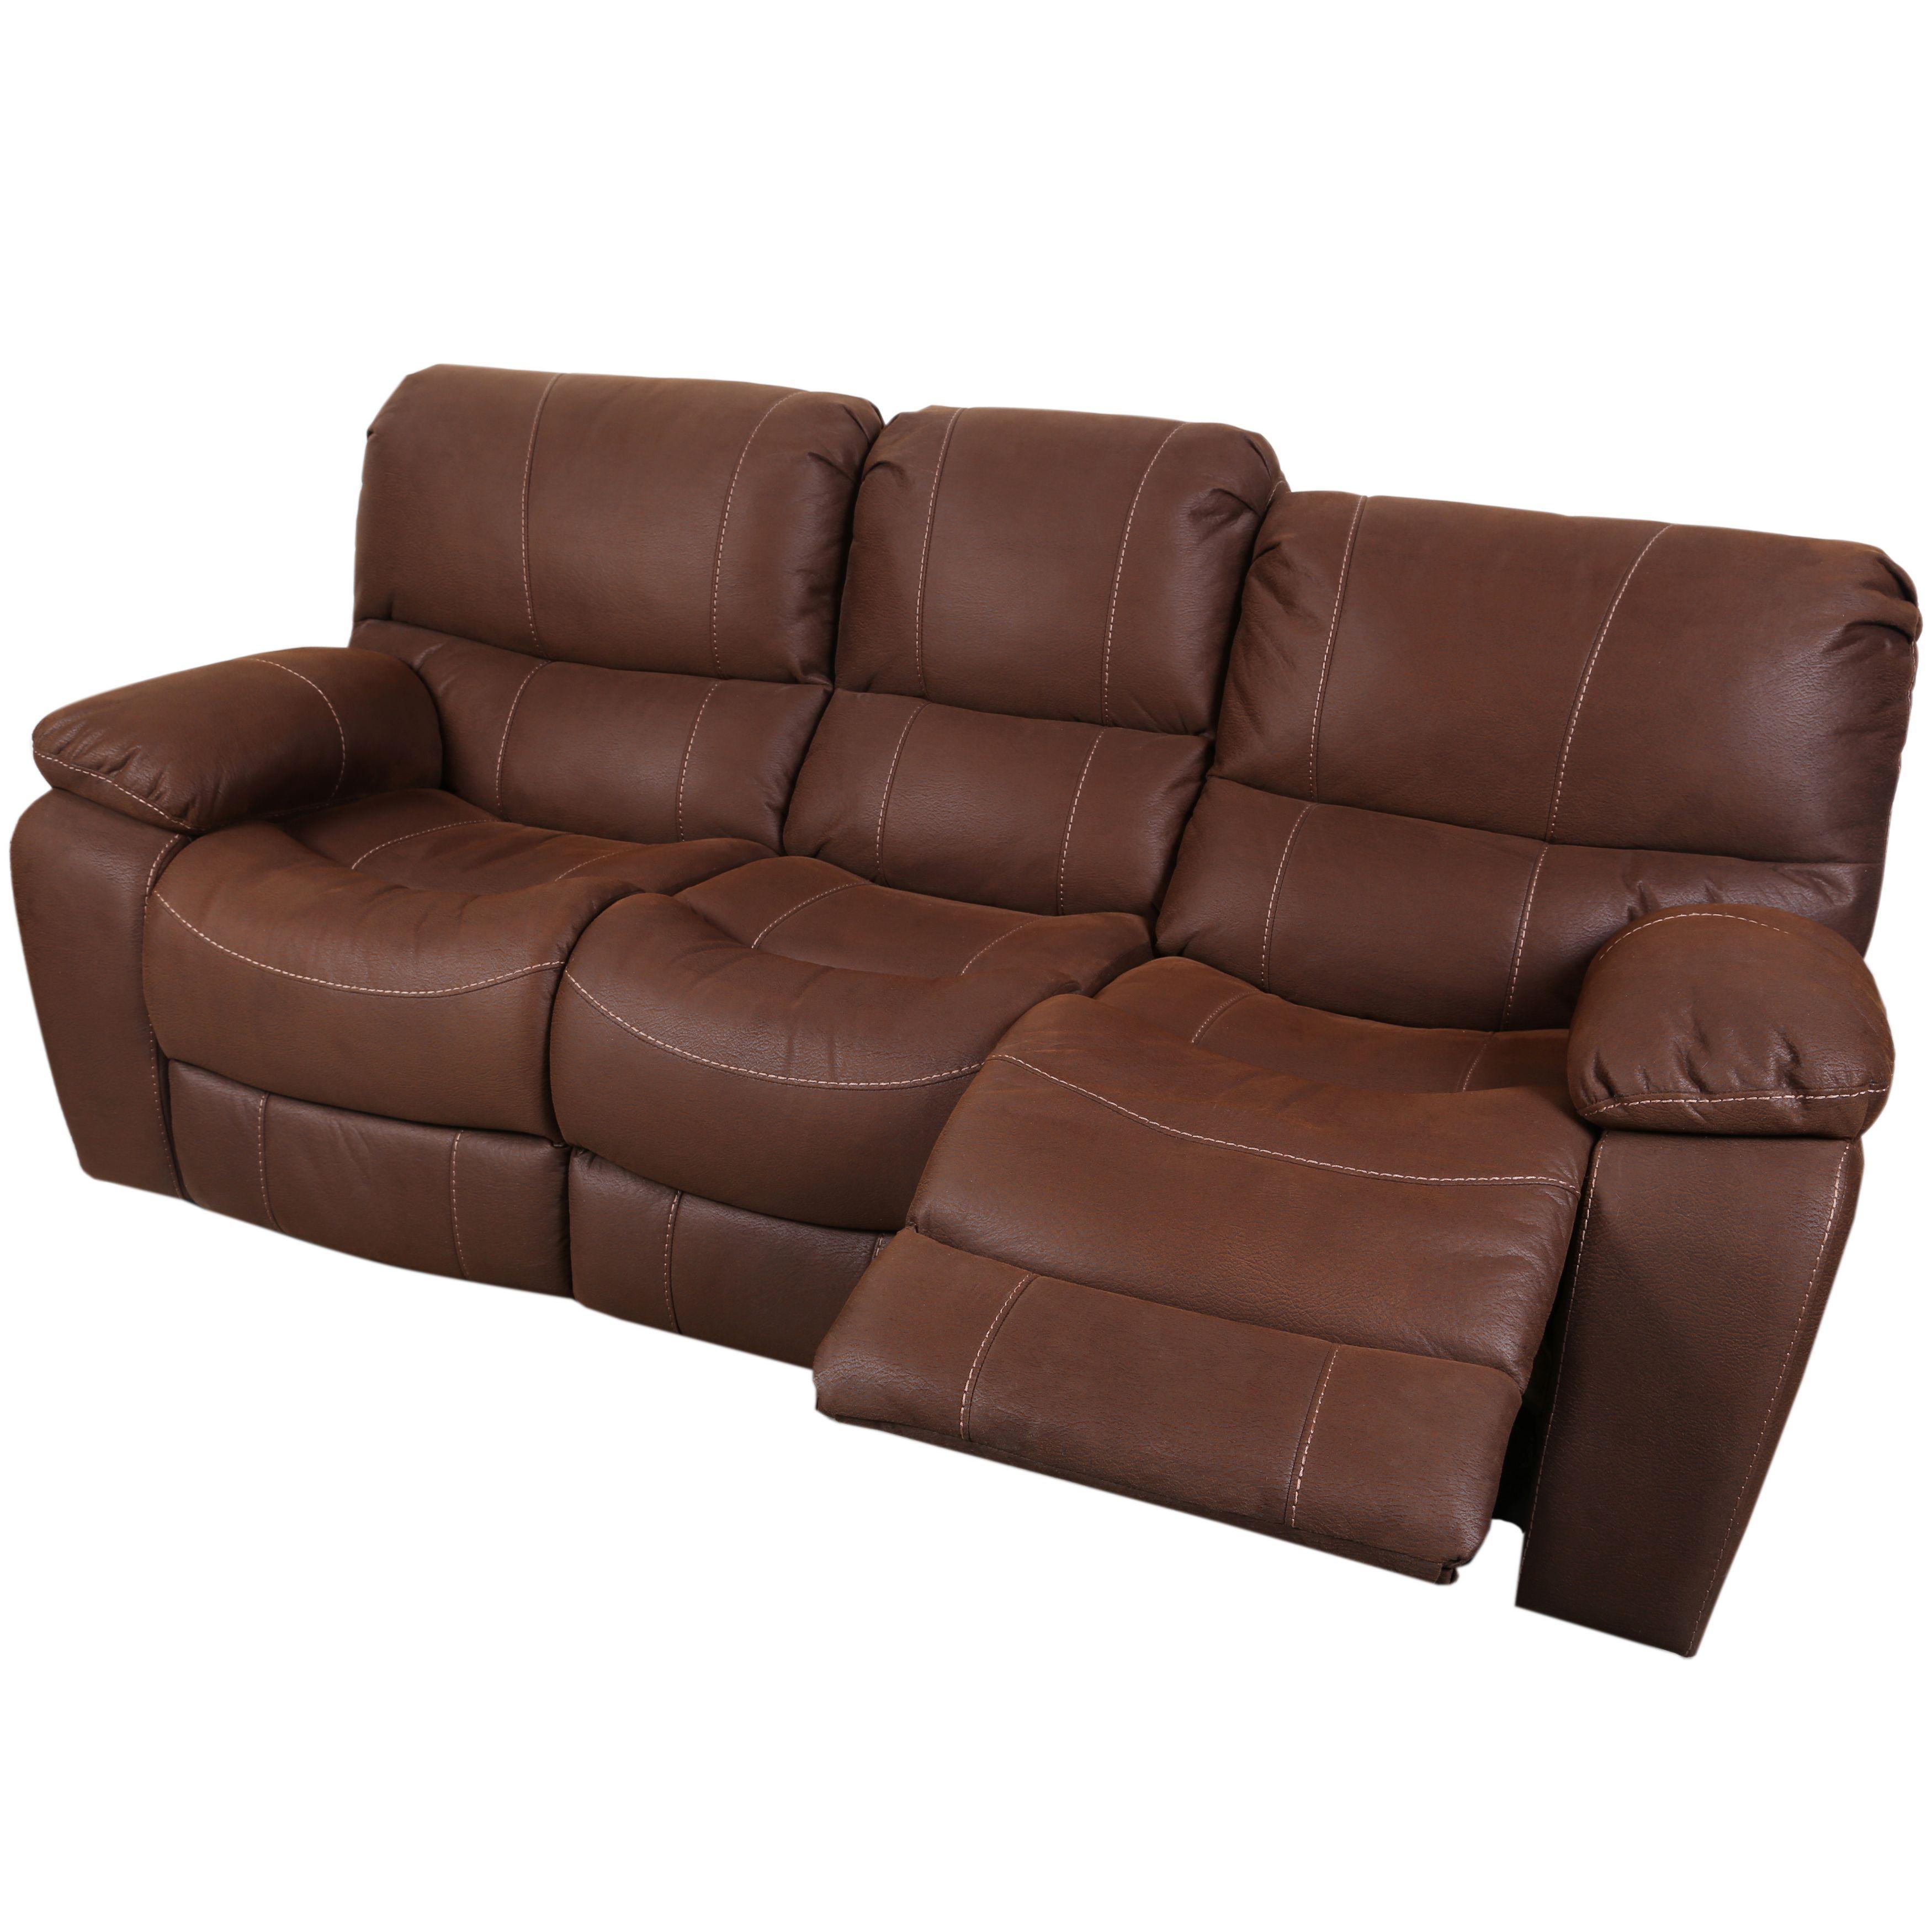 Sofa Sale Porter Ramsey Brown Embossed Microfiber Dual Reclining Sofa by Porter International Designs